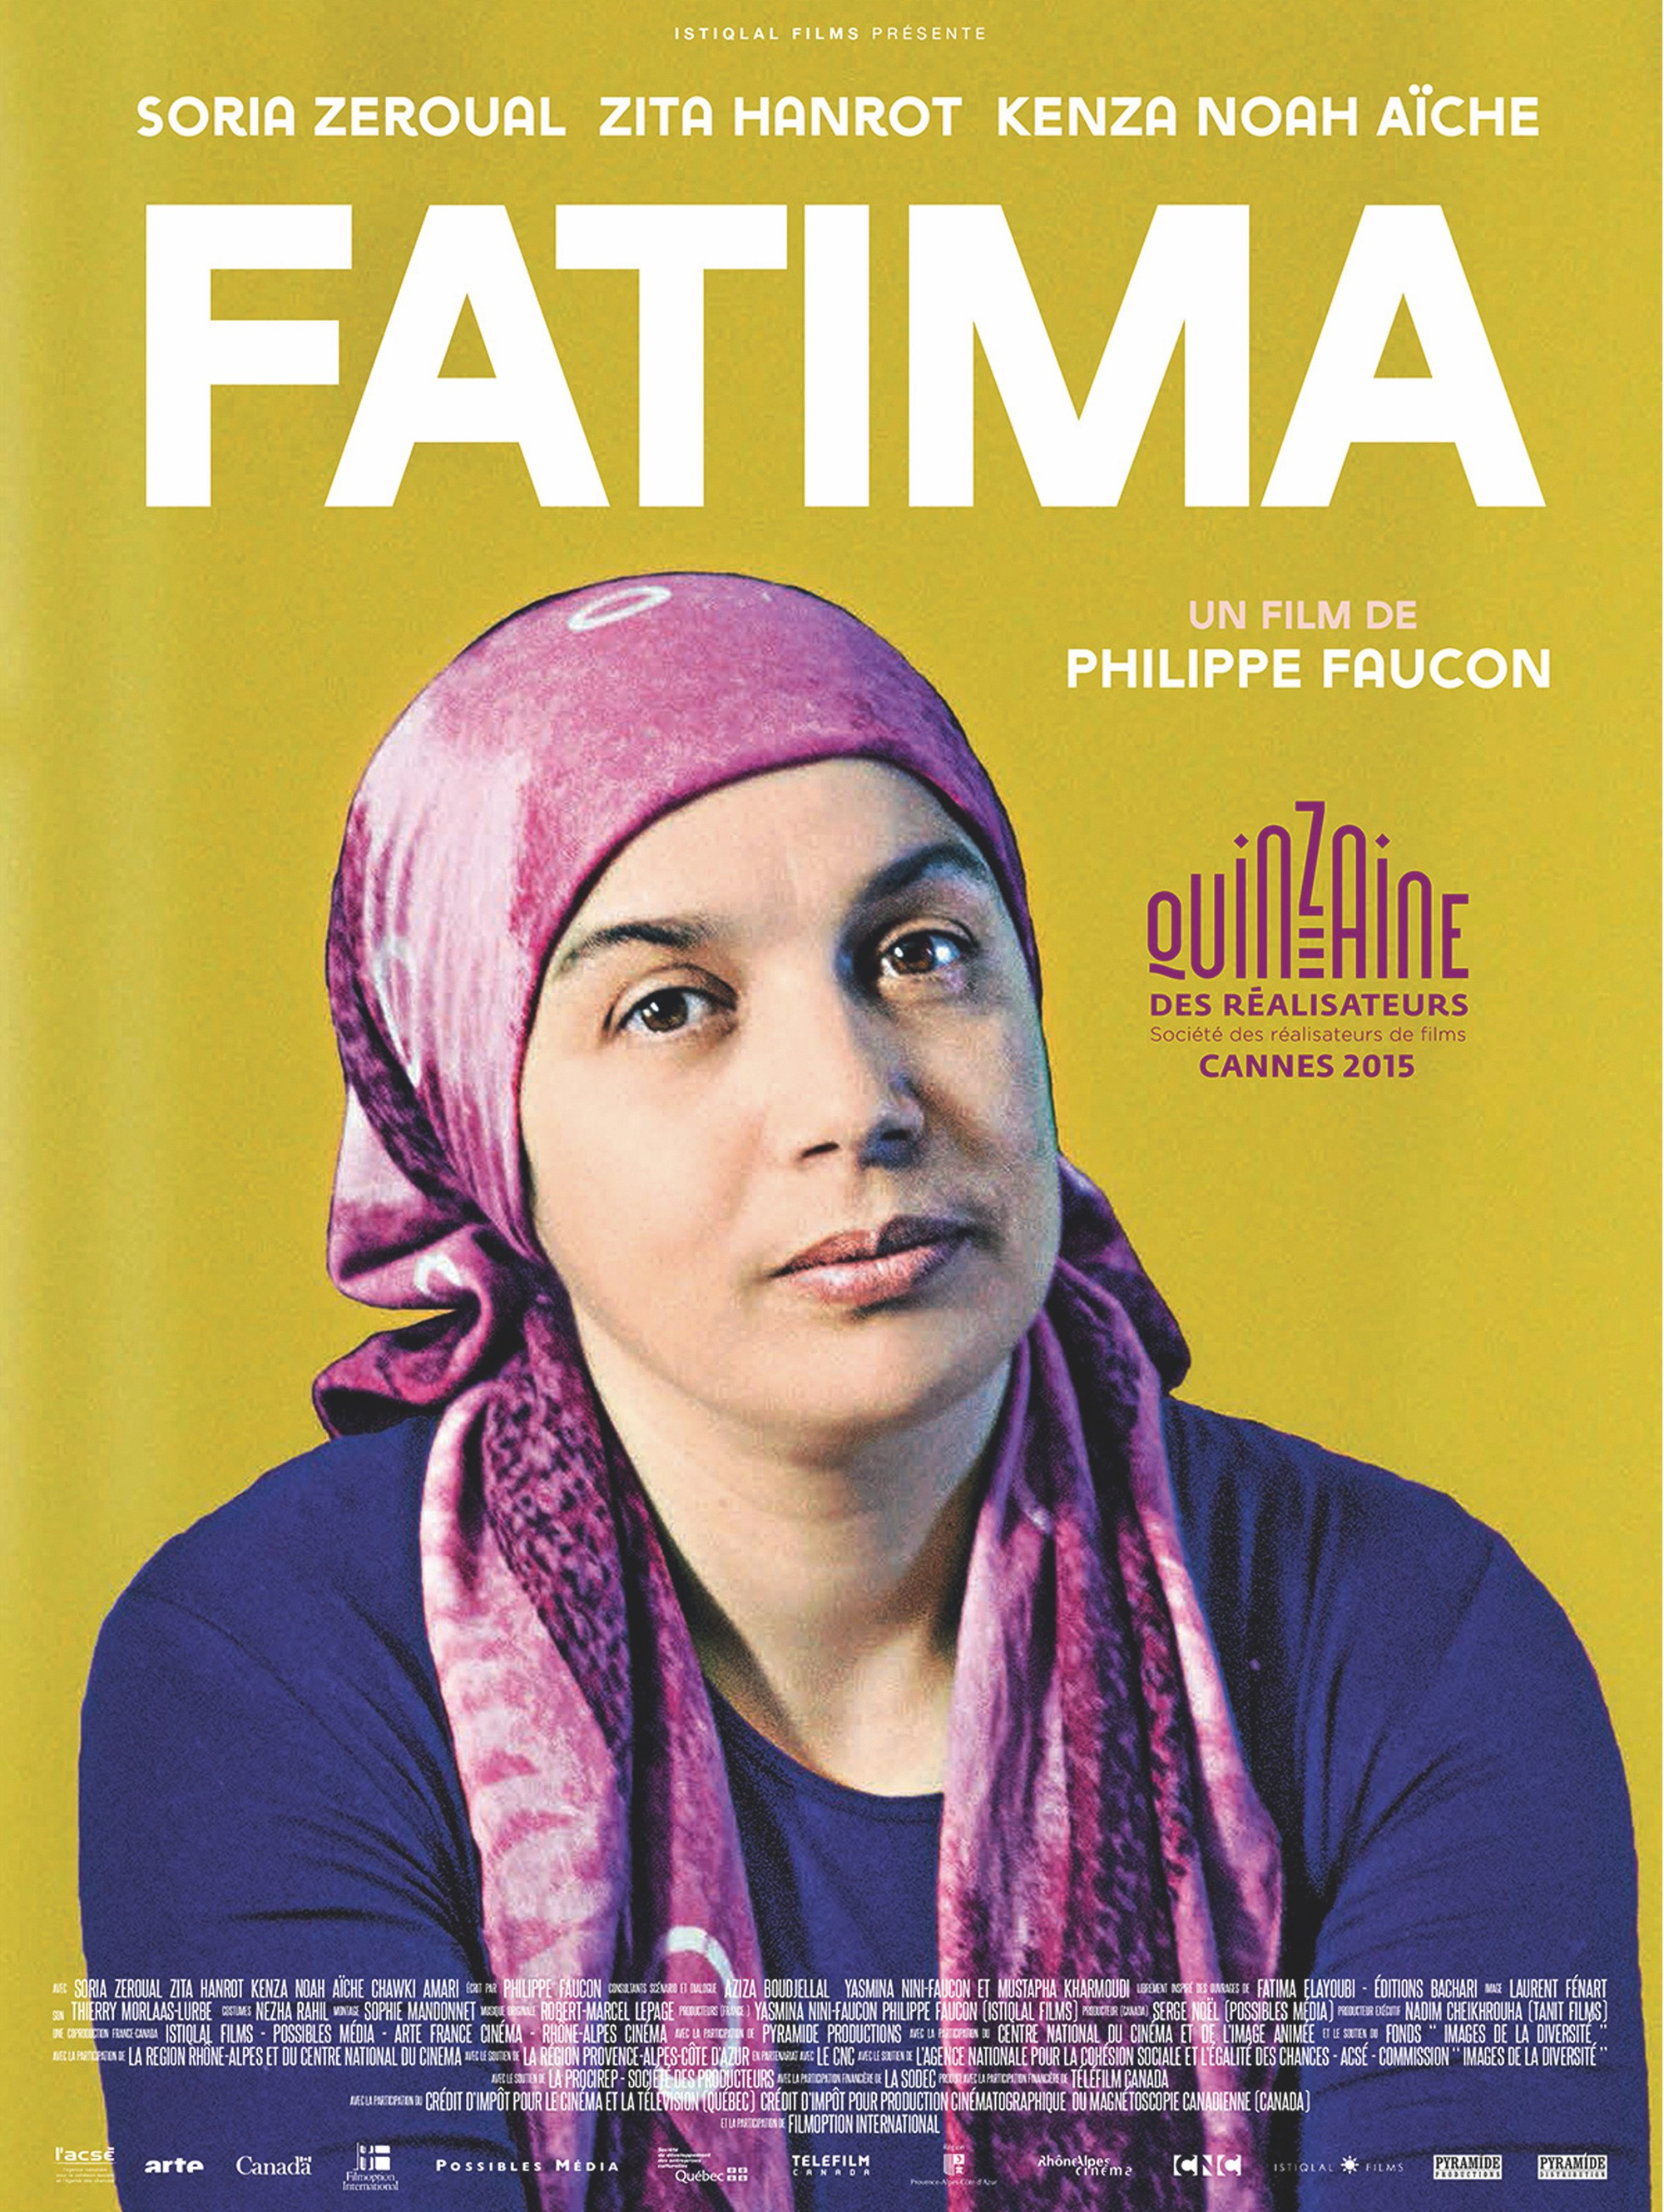 Affiche du film Fatima de Philippe Faucon, 2015